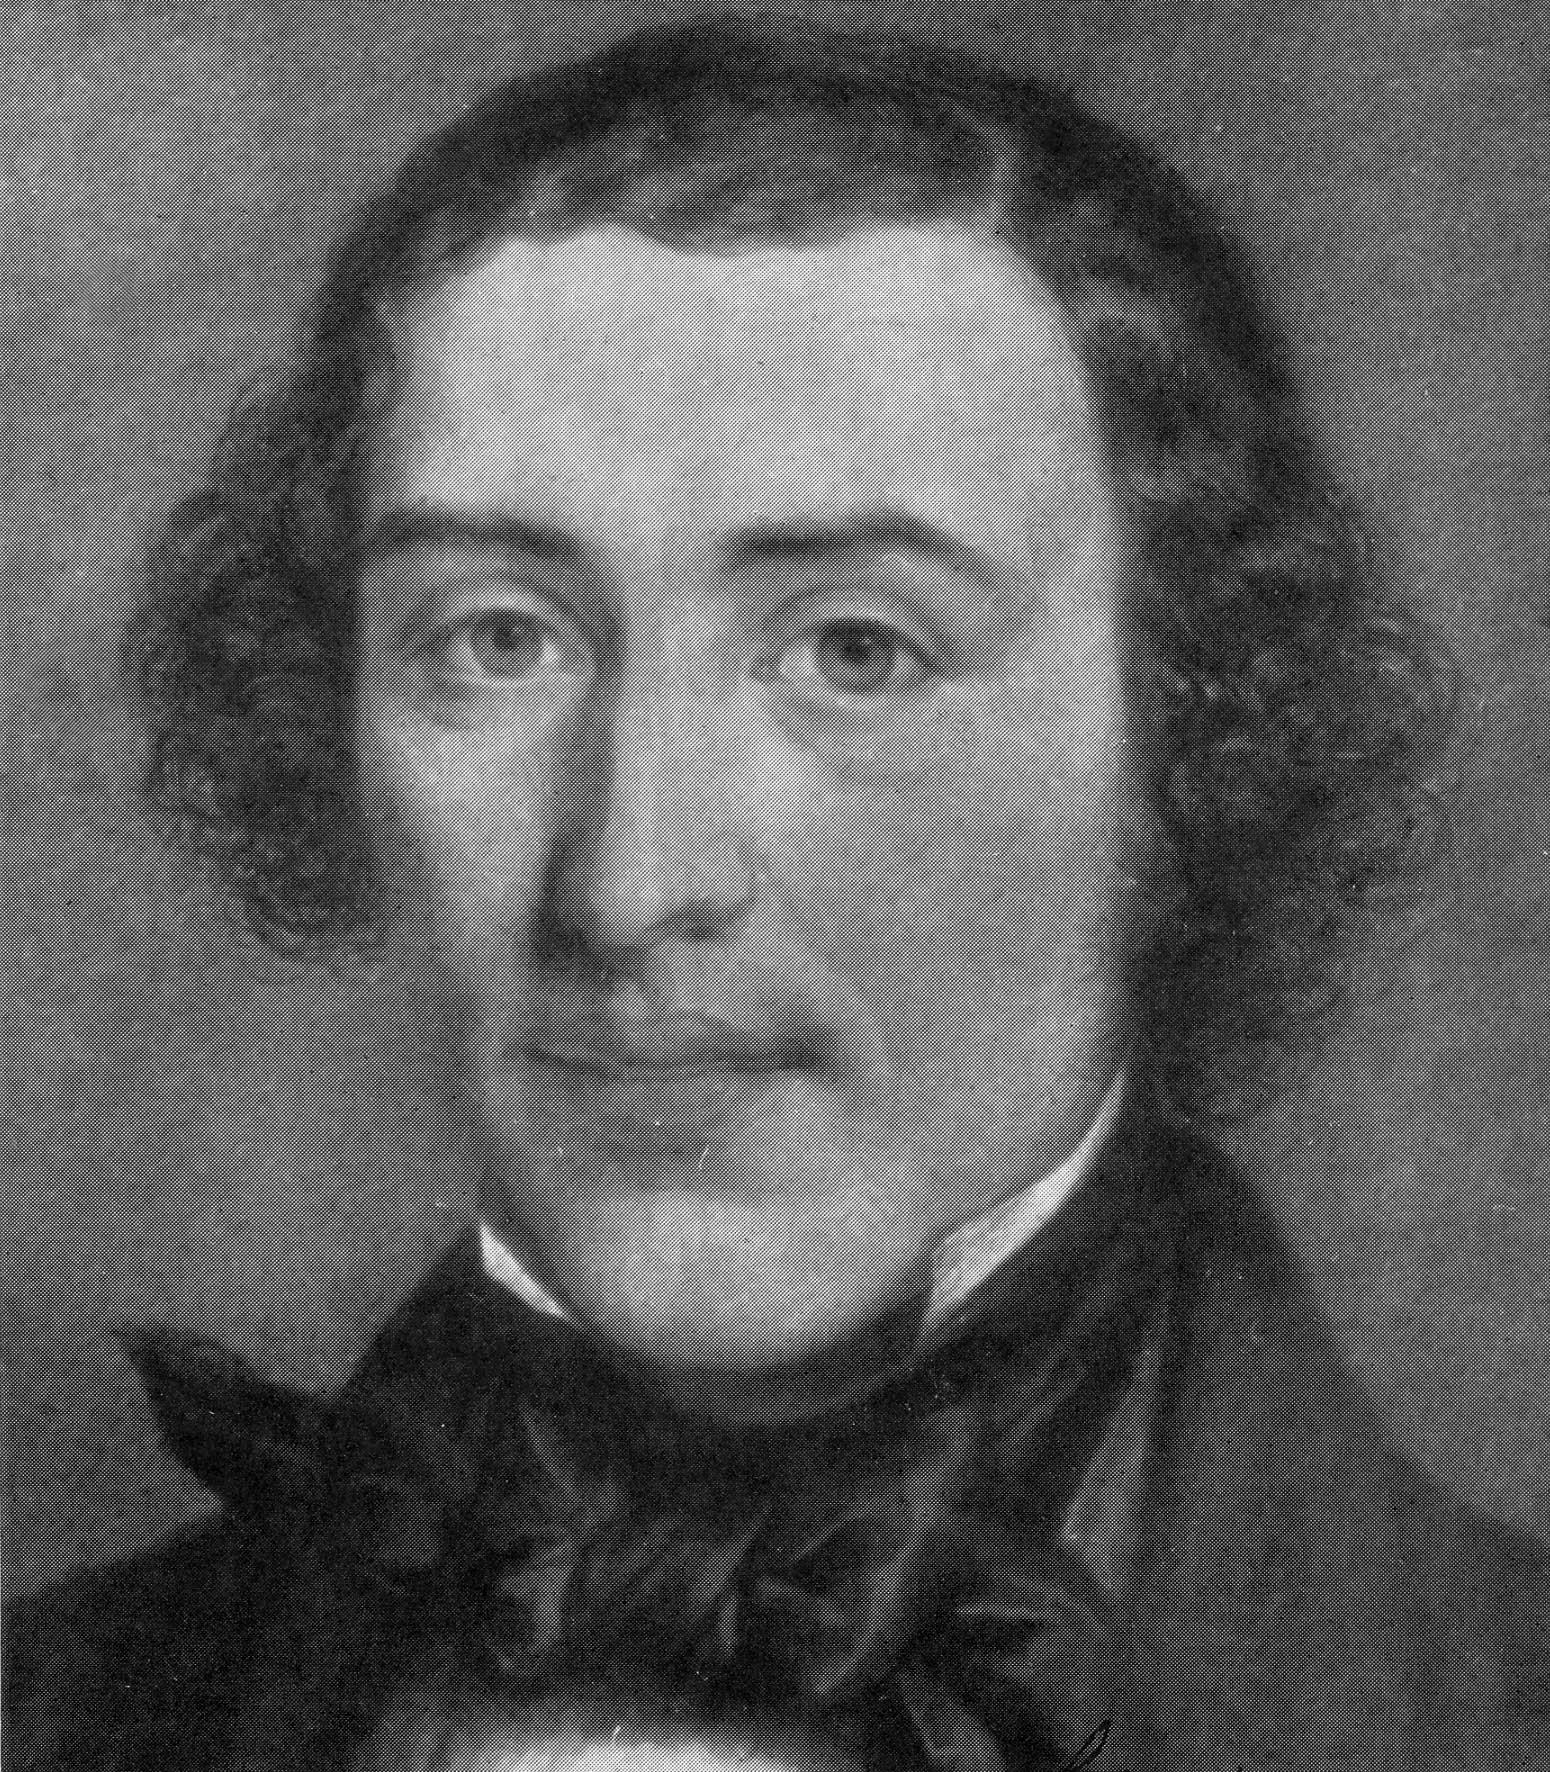 John Hutchinson